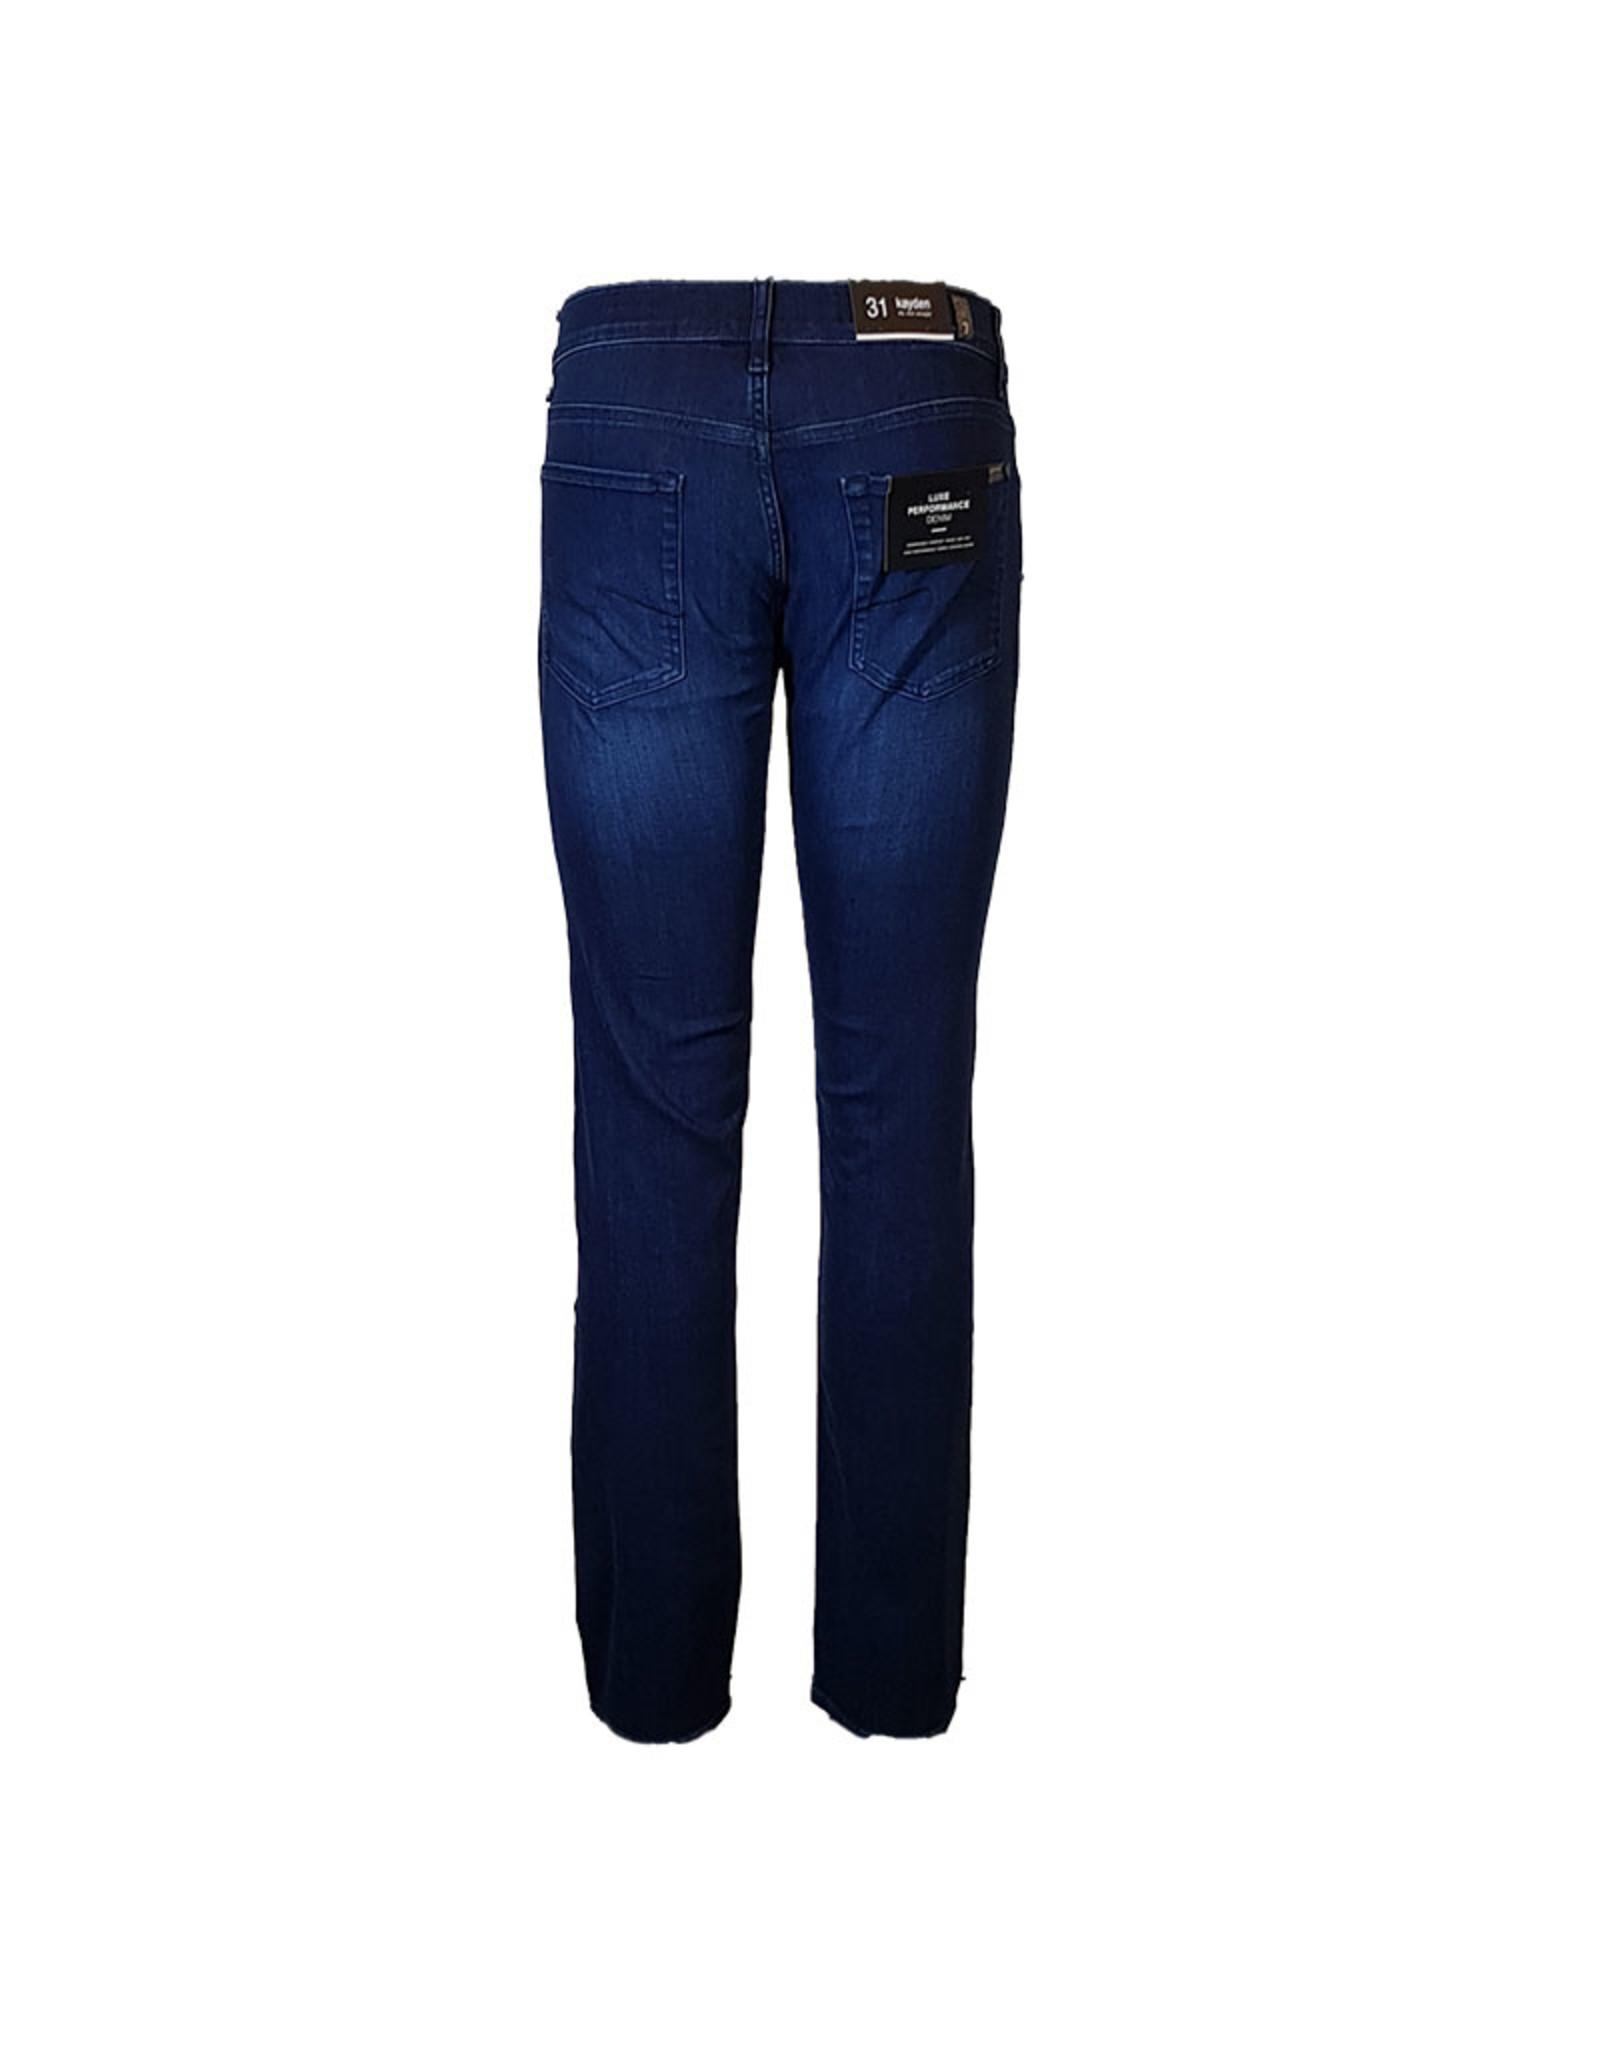 7 For All Mankind 7FAM jeans blauw Kayden JSMTR750PC